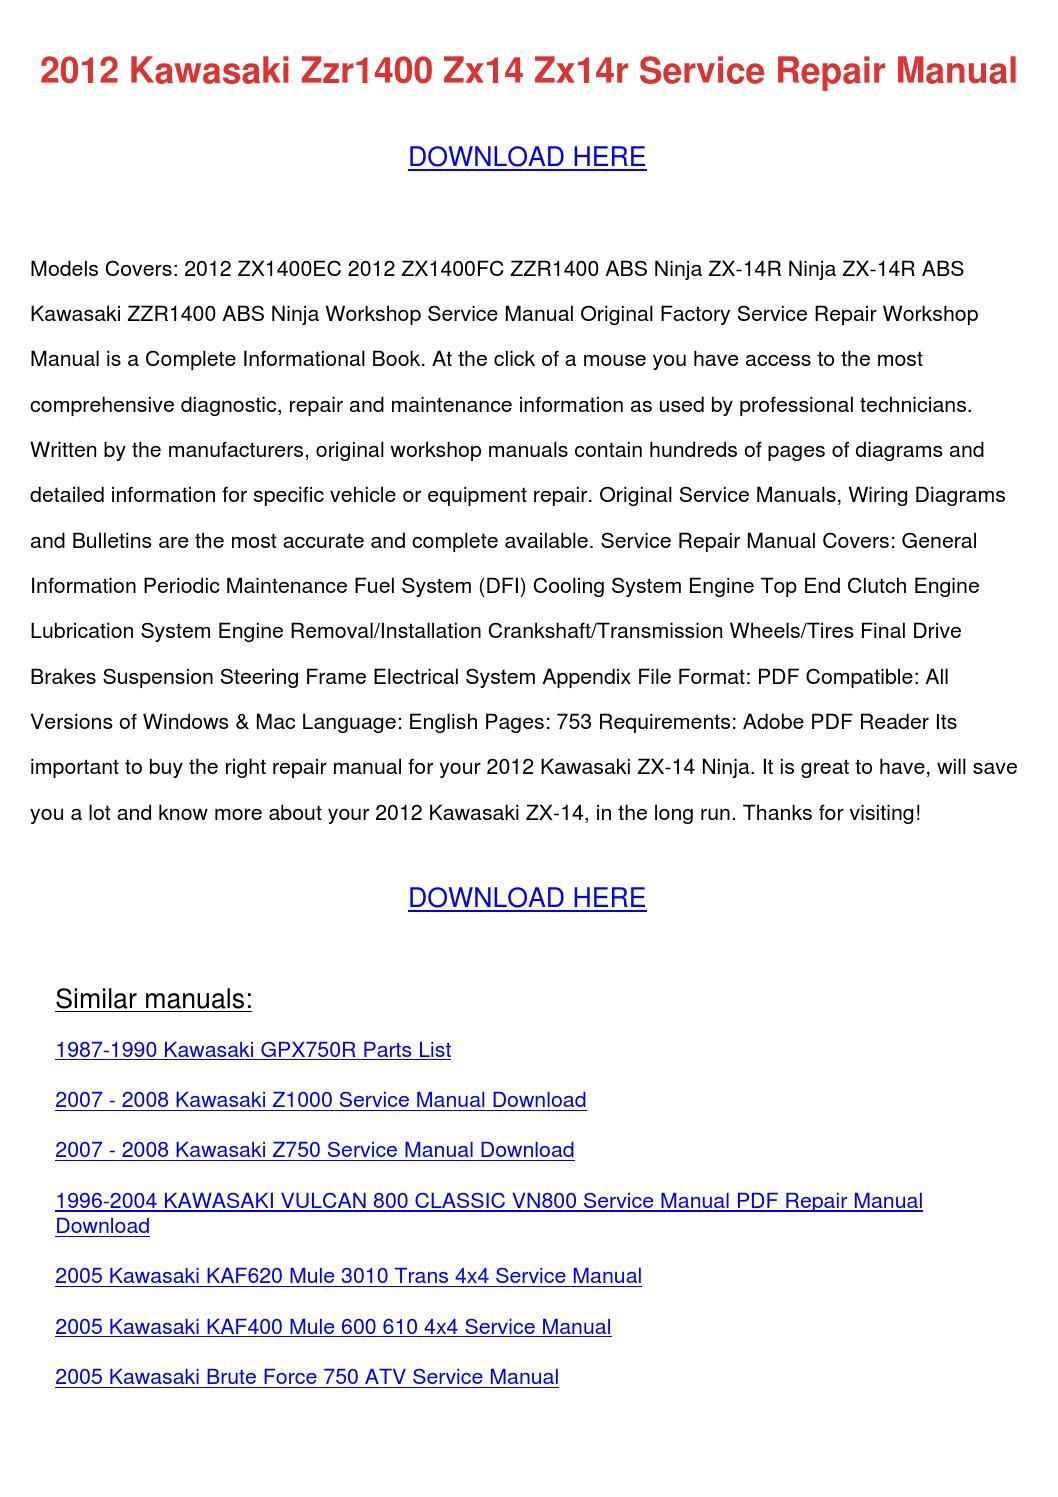 2012 Kawasaki Zzr1400 Zx14 Zx14r Service Repa By border=